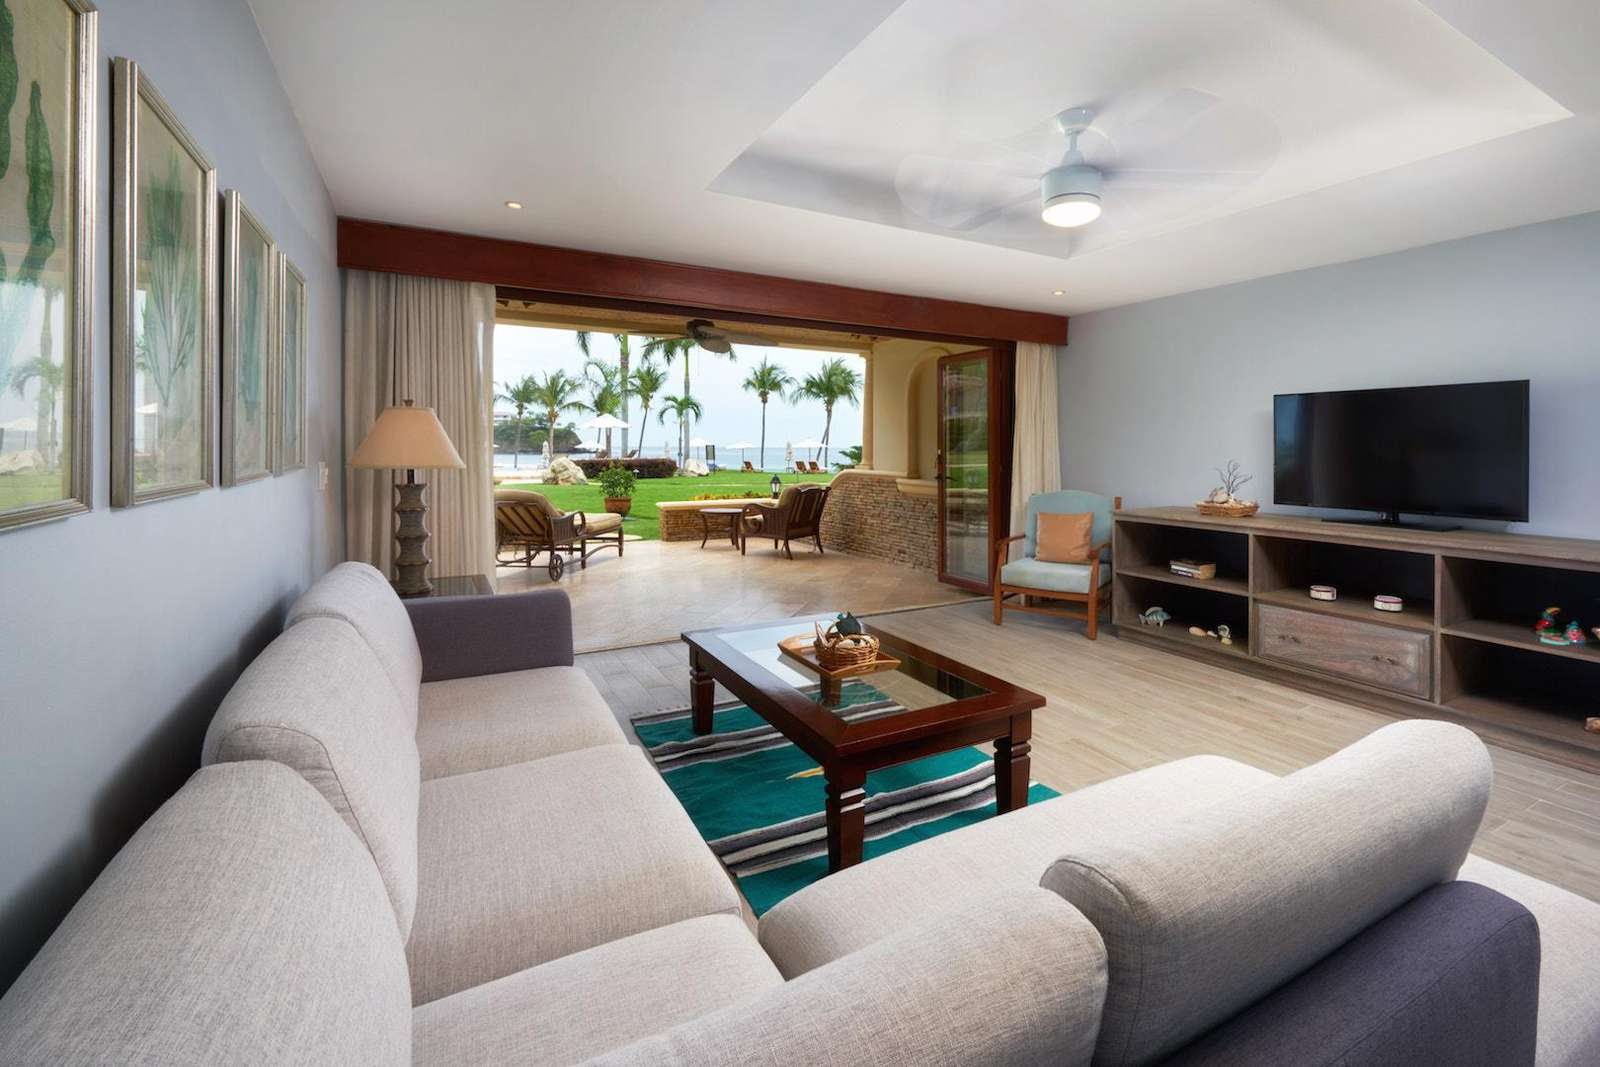 Spacious living area, oceanfront views